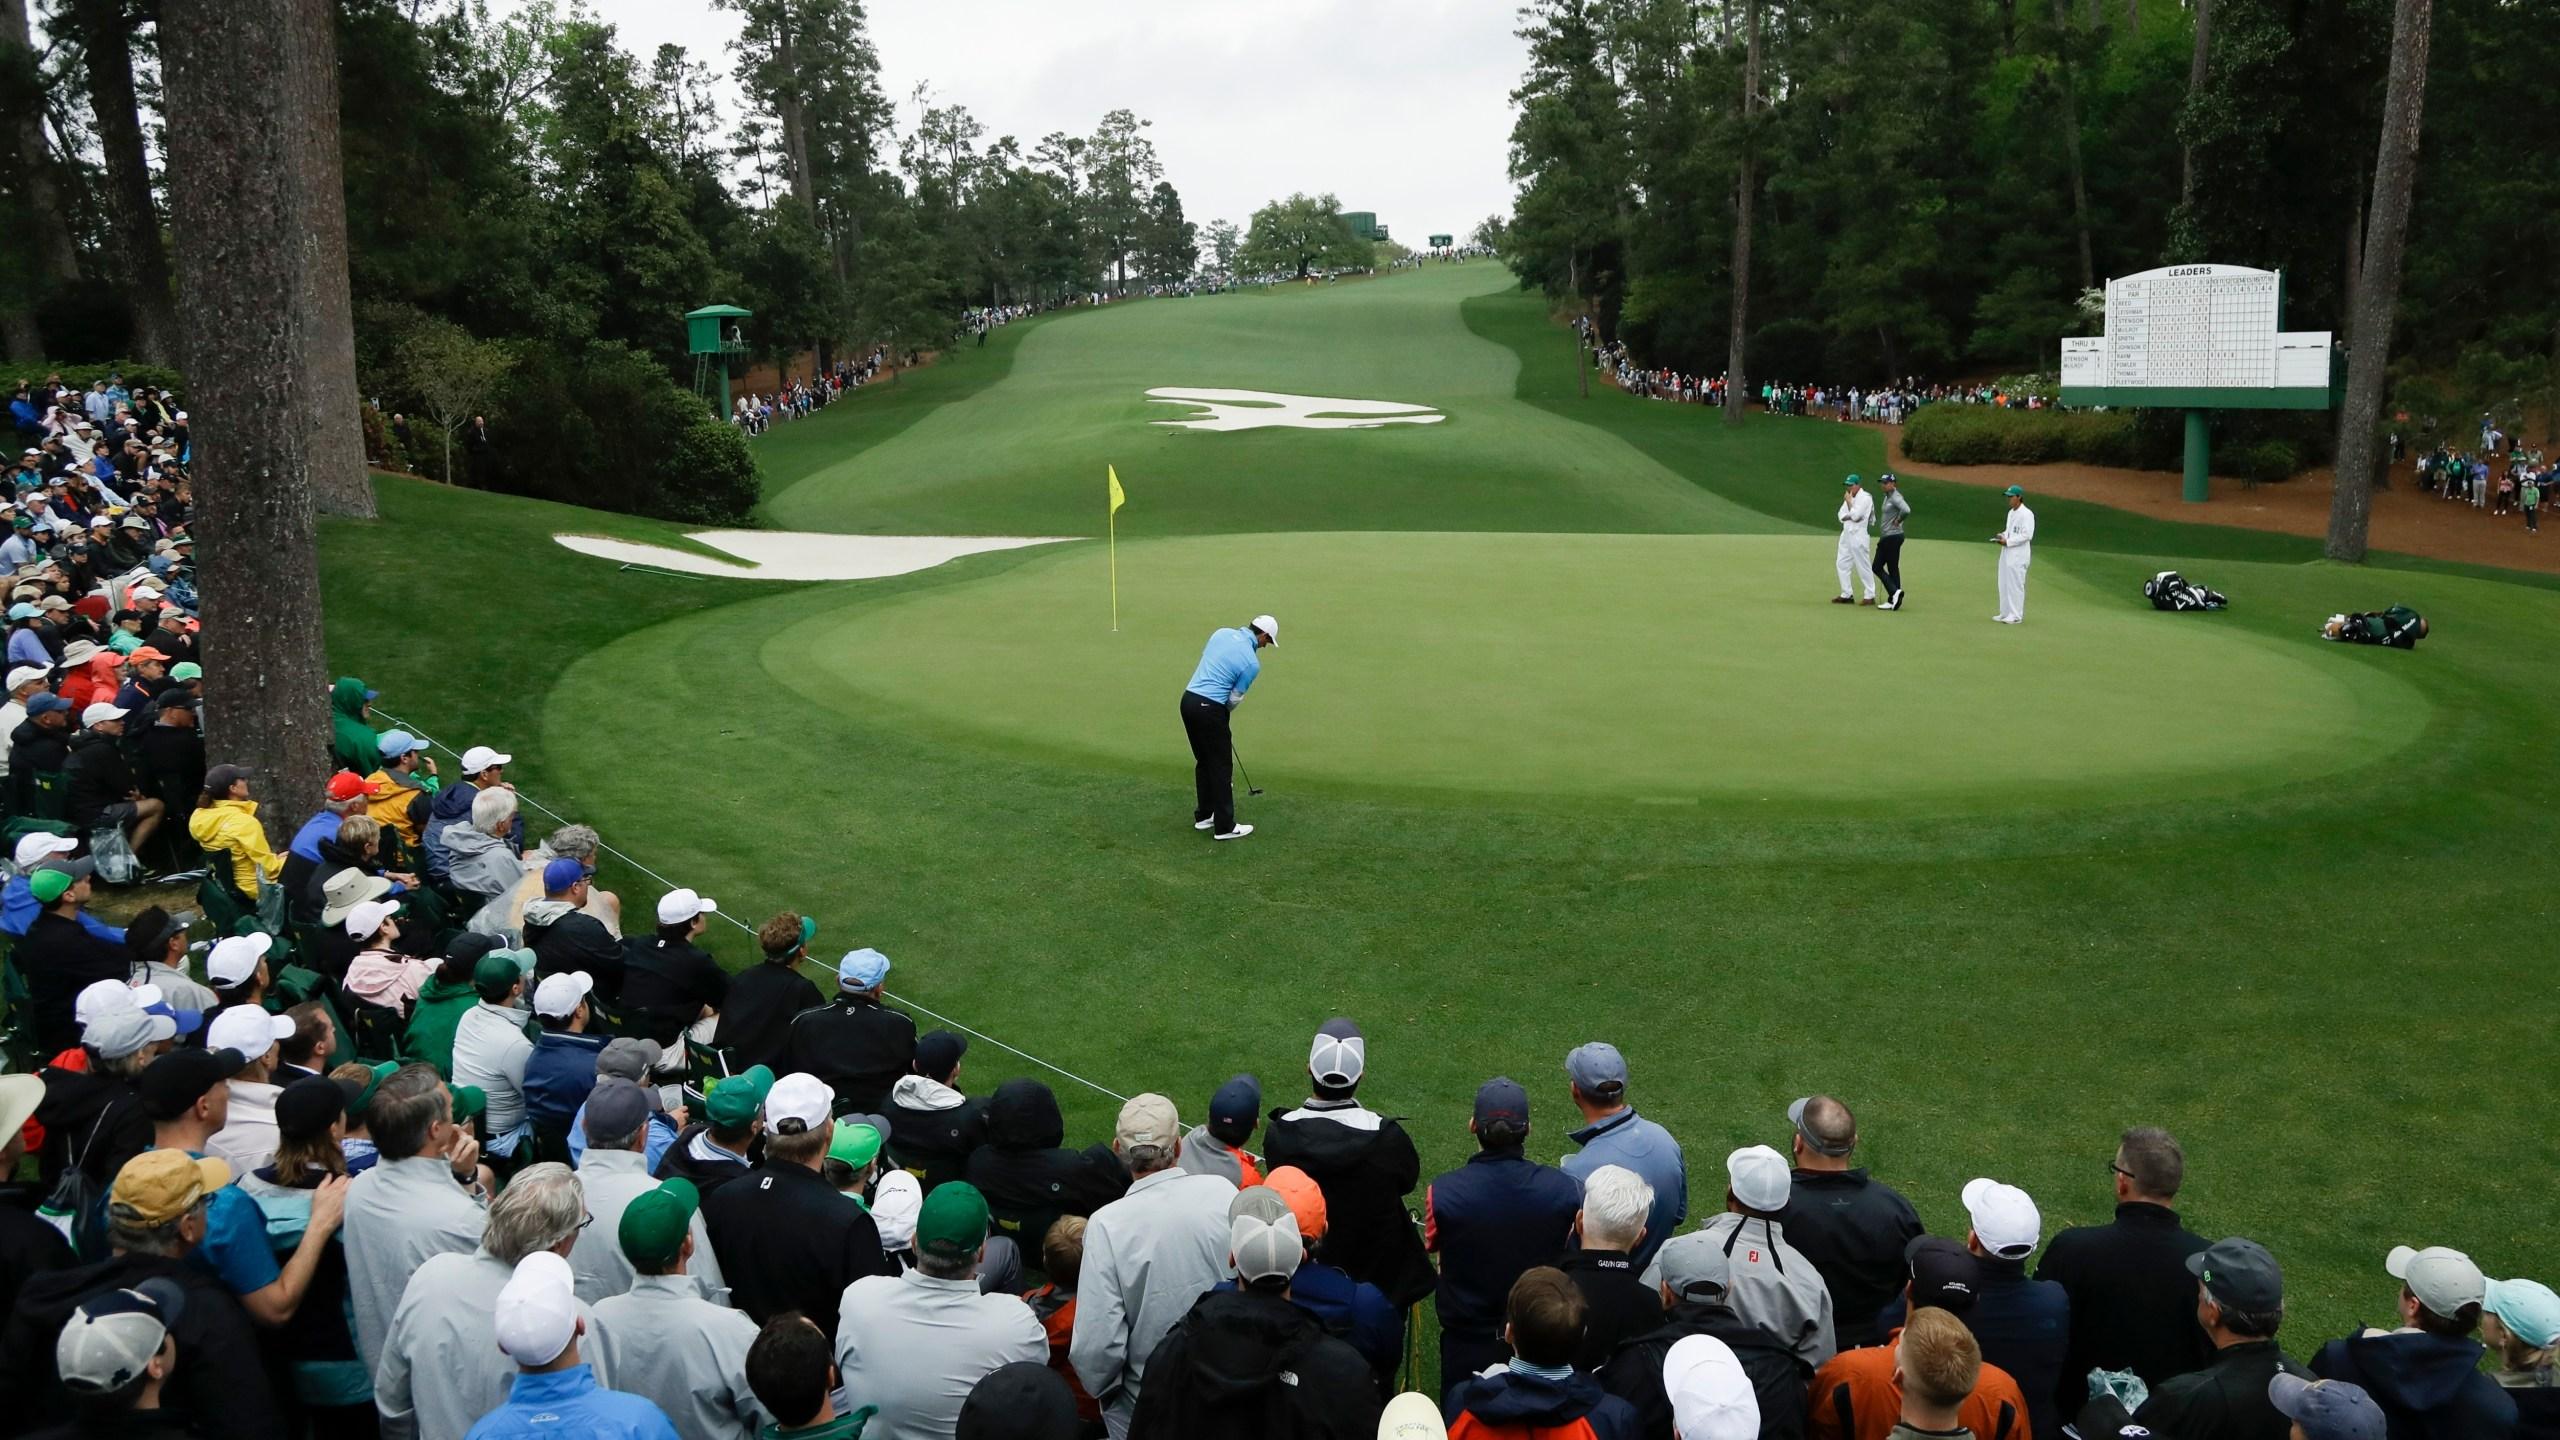 Masters_Golf_90416-159532-159532.jpg55150783